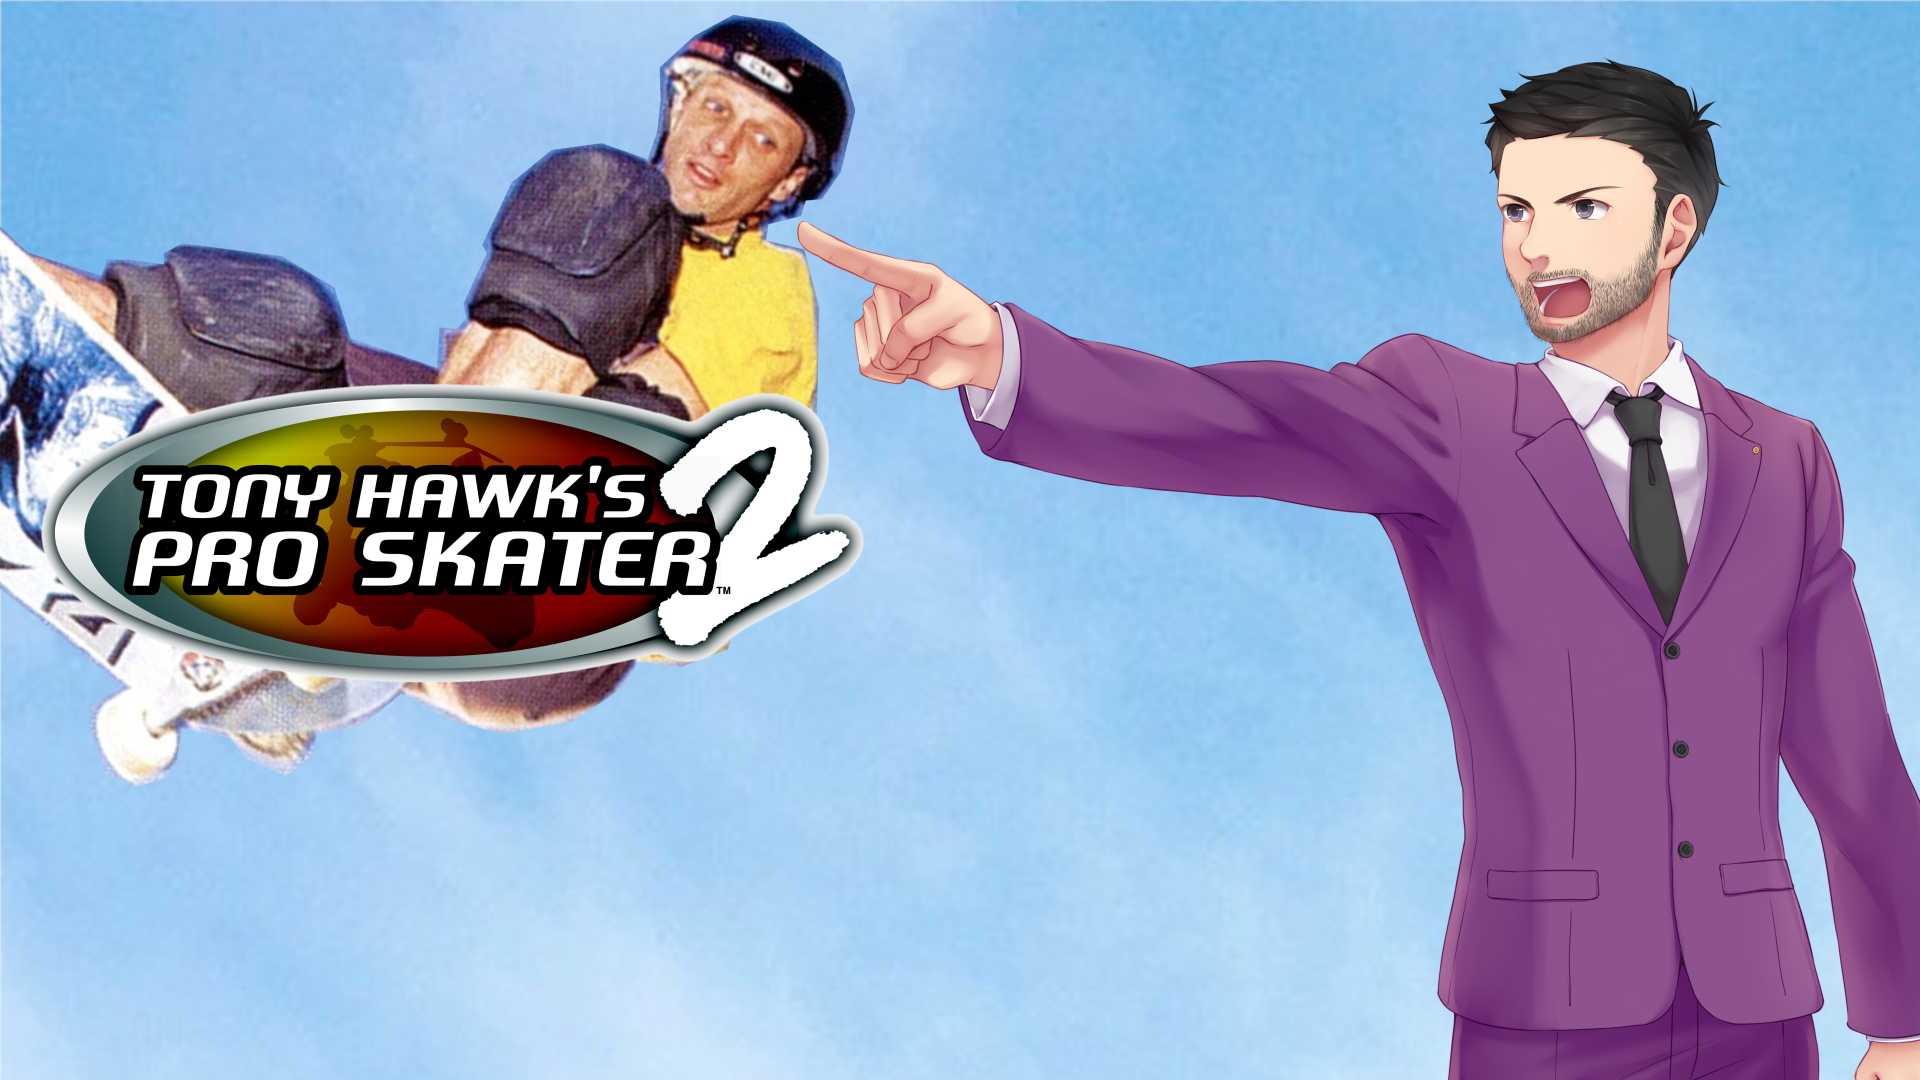 Tony Hawk's Pro Skater 2 – FalseProof